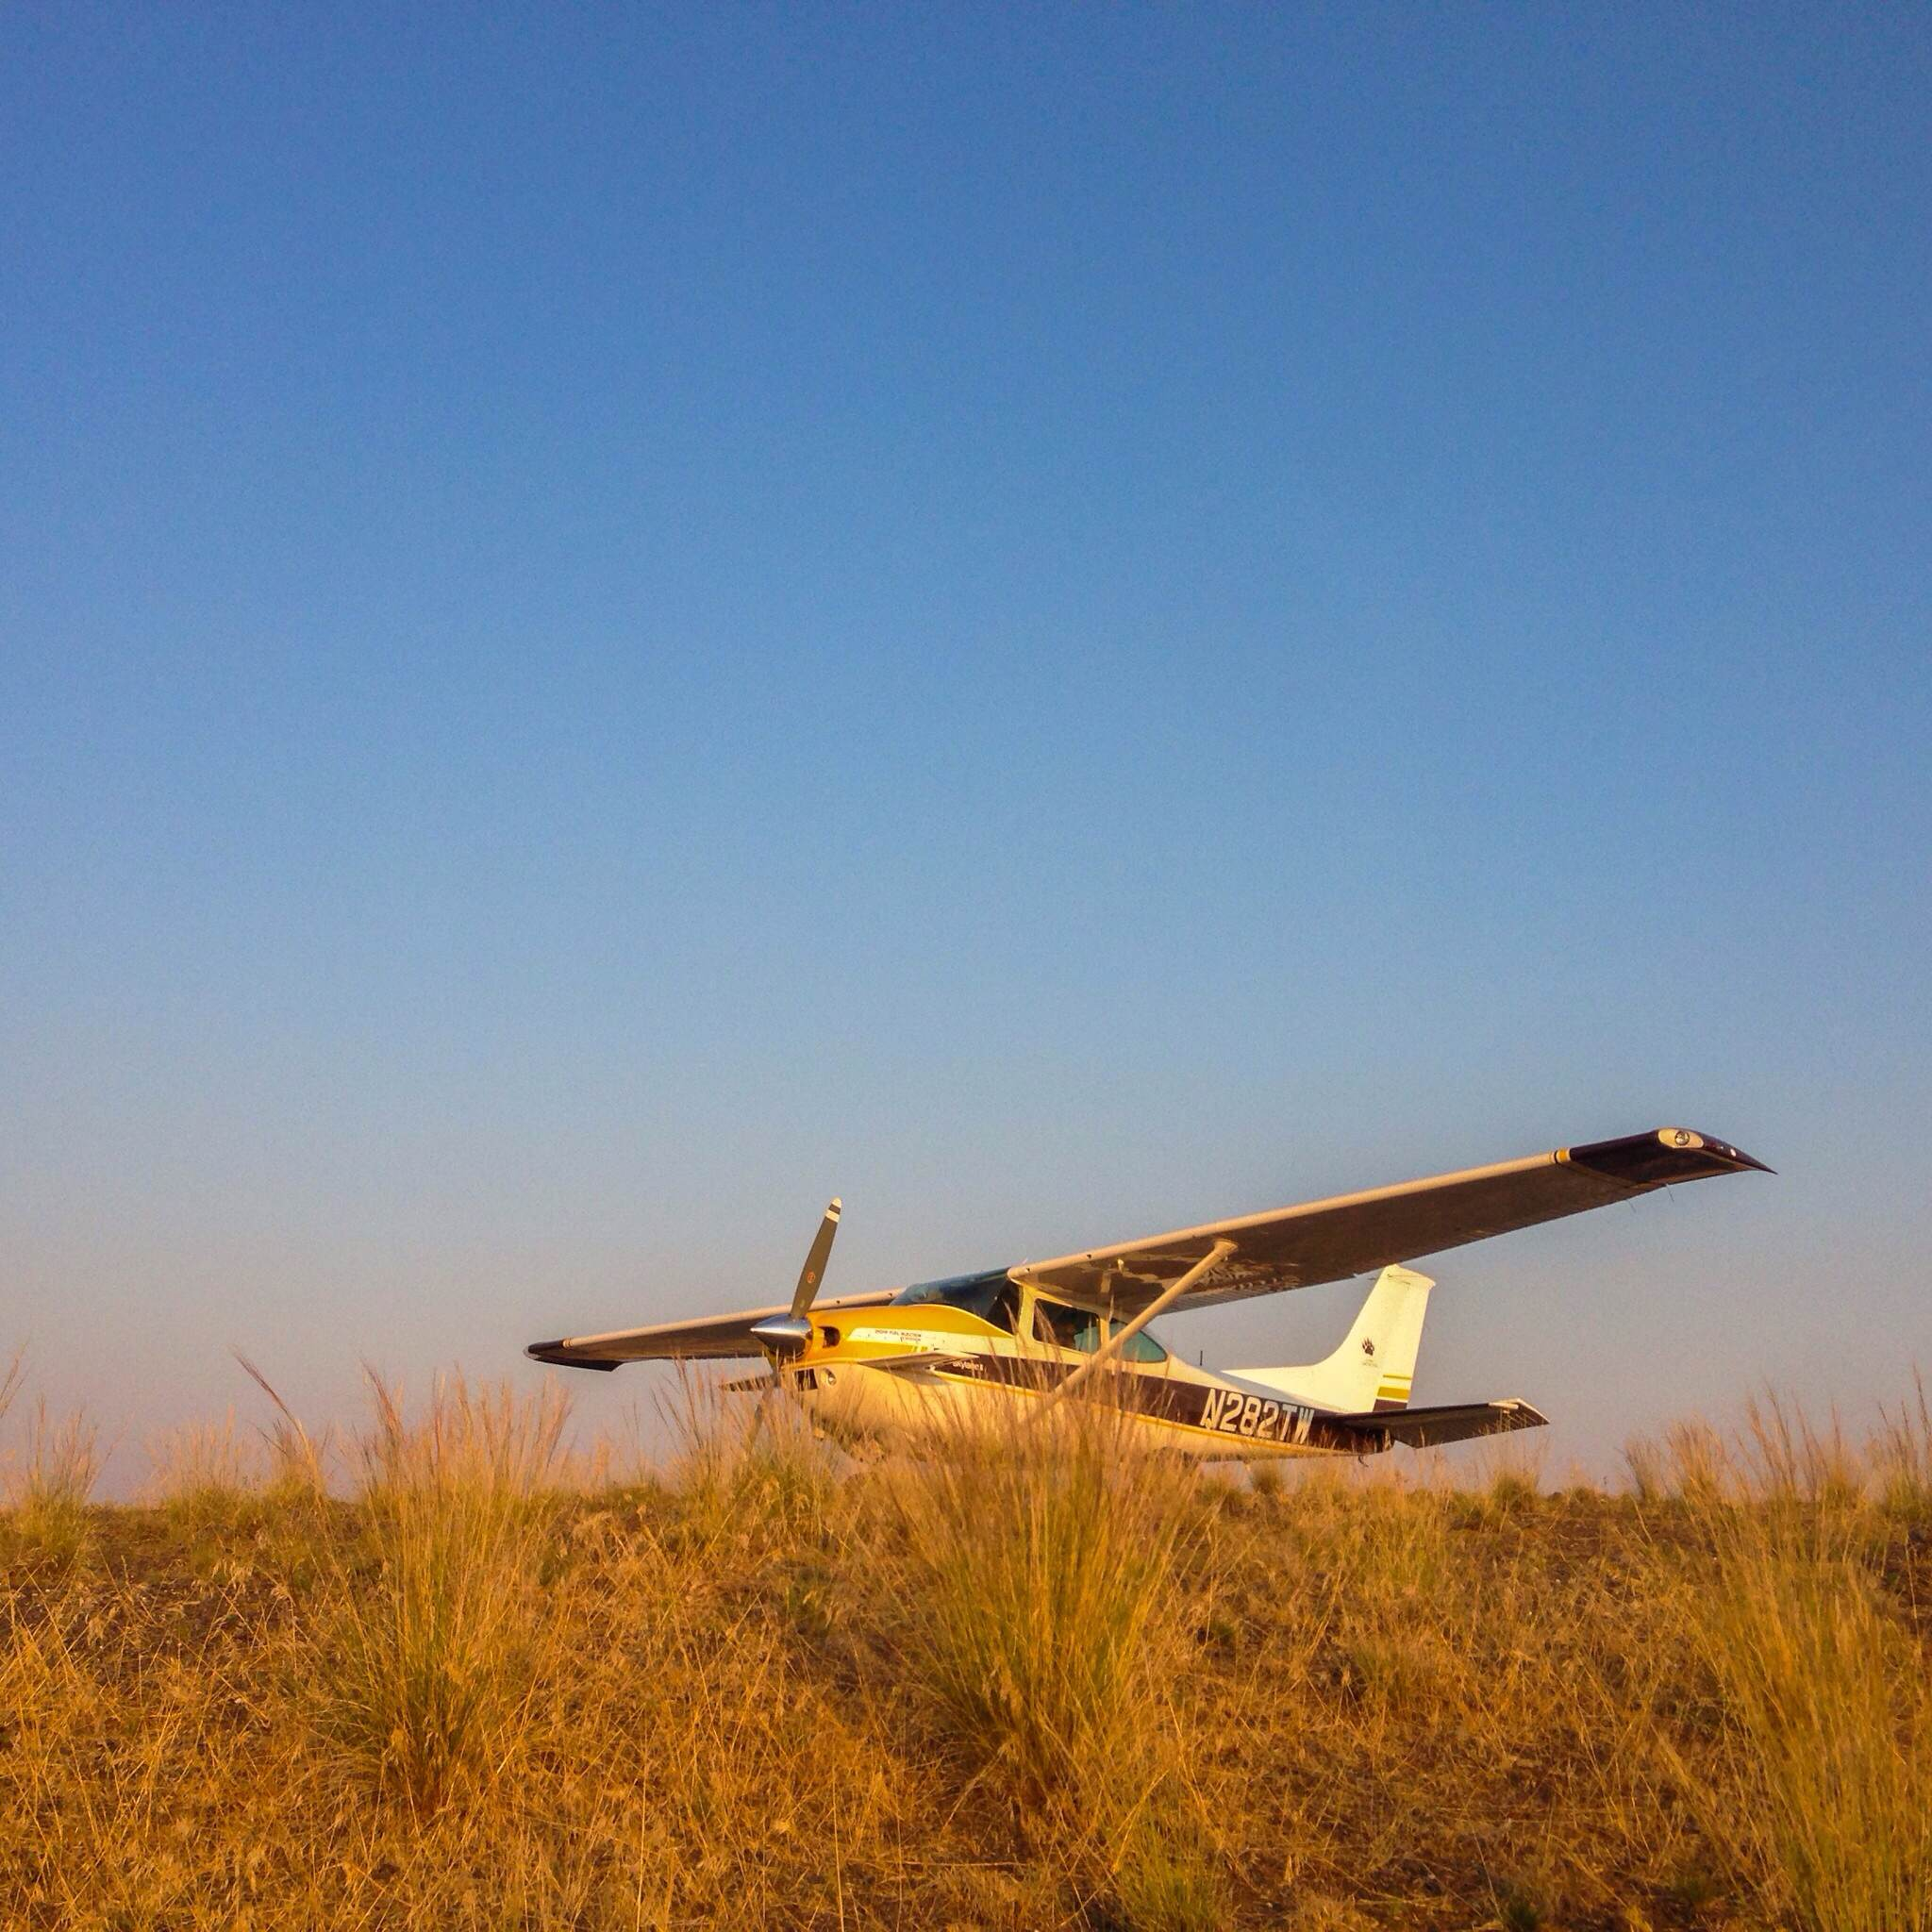 Aircraft of the Week – Cessna 182 Skylane